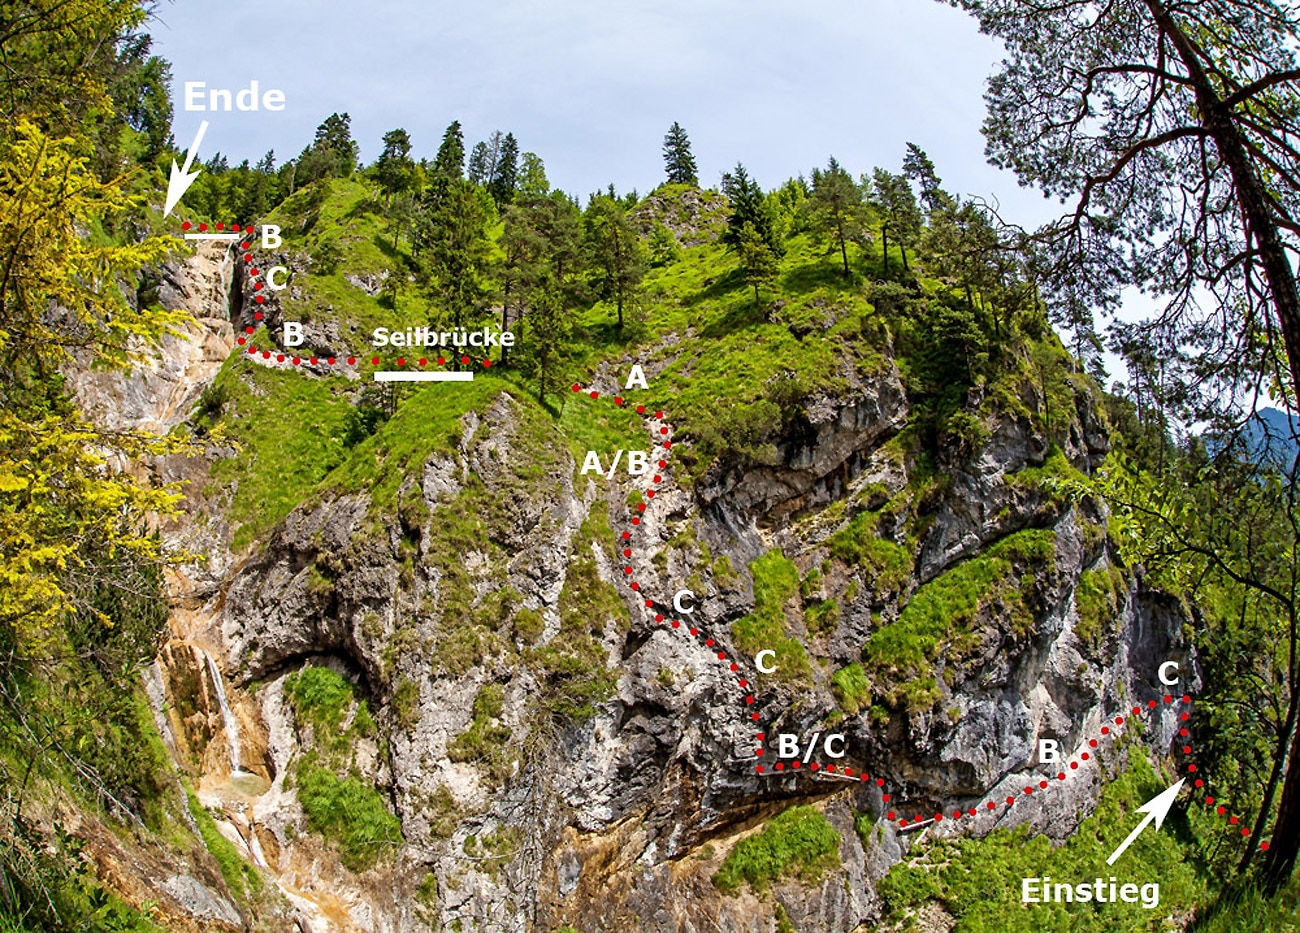 Klettersteig Hausbachfall : Klettersteige hausbachfall km bergwelten